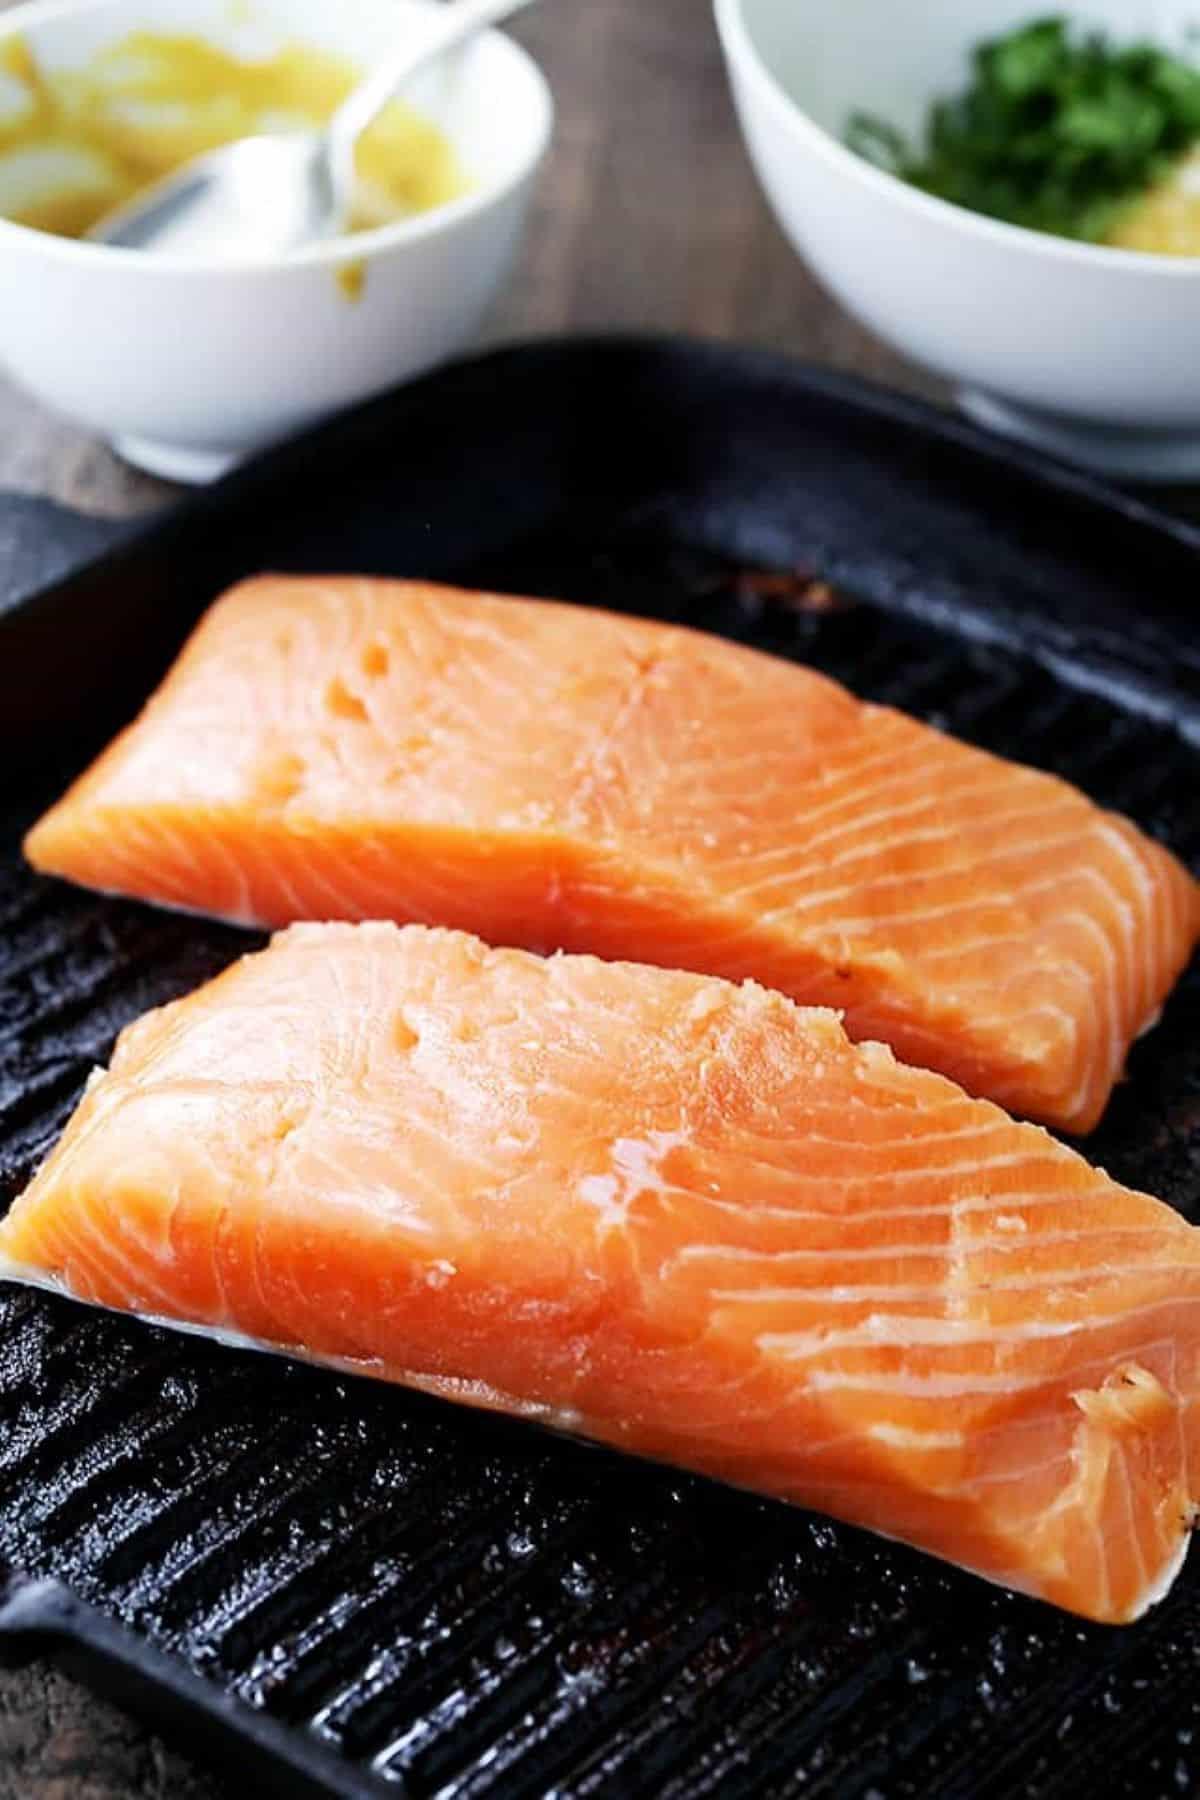 Sliced raw salmon fillets.